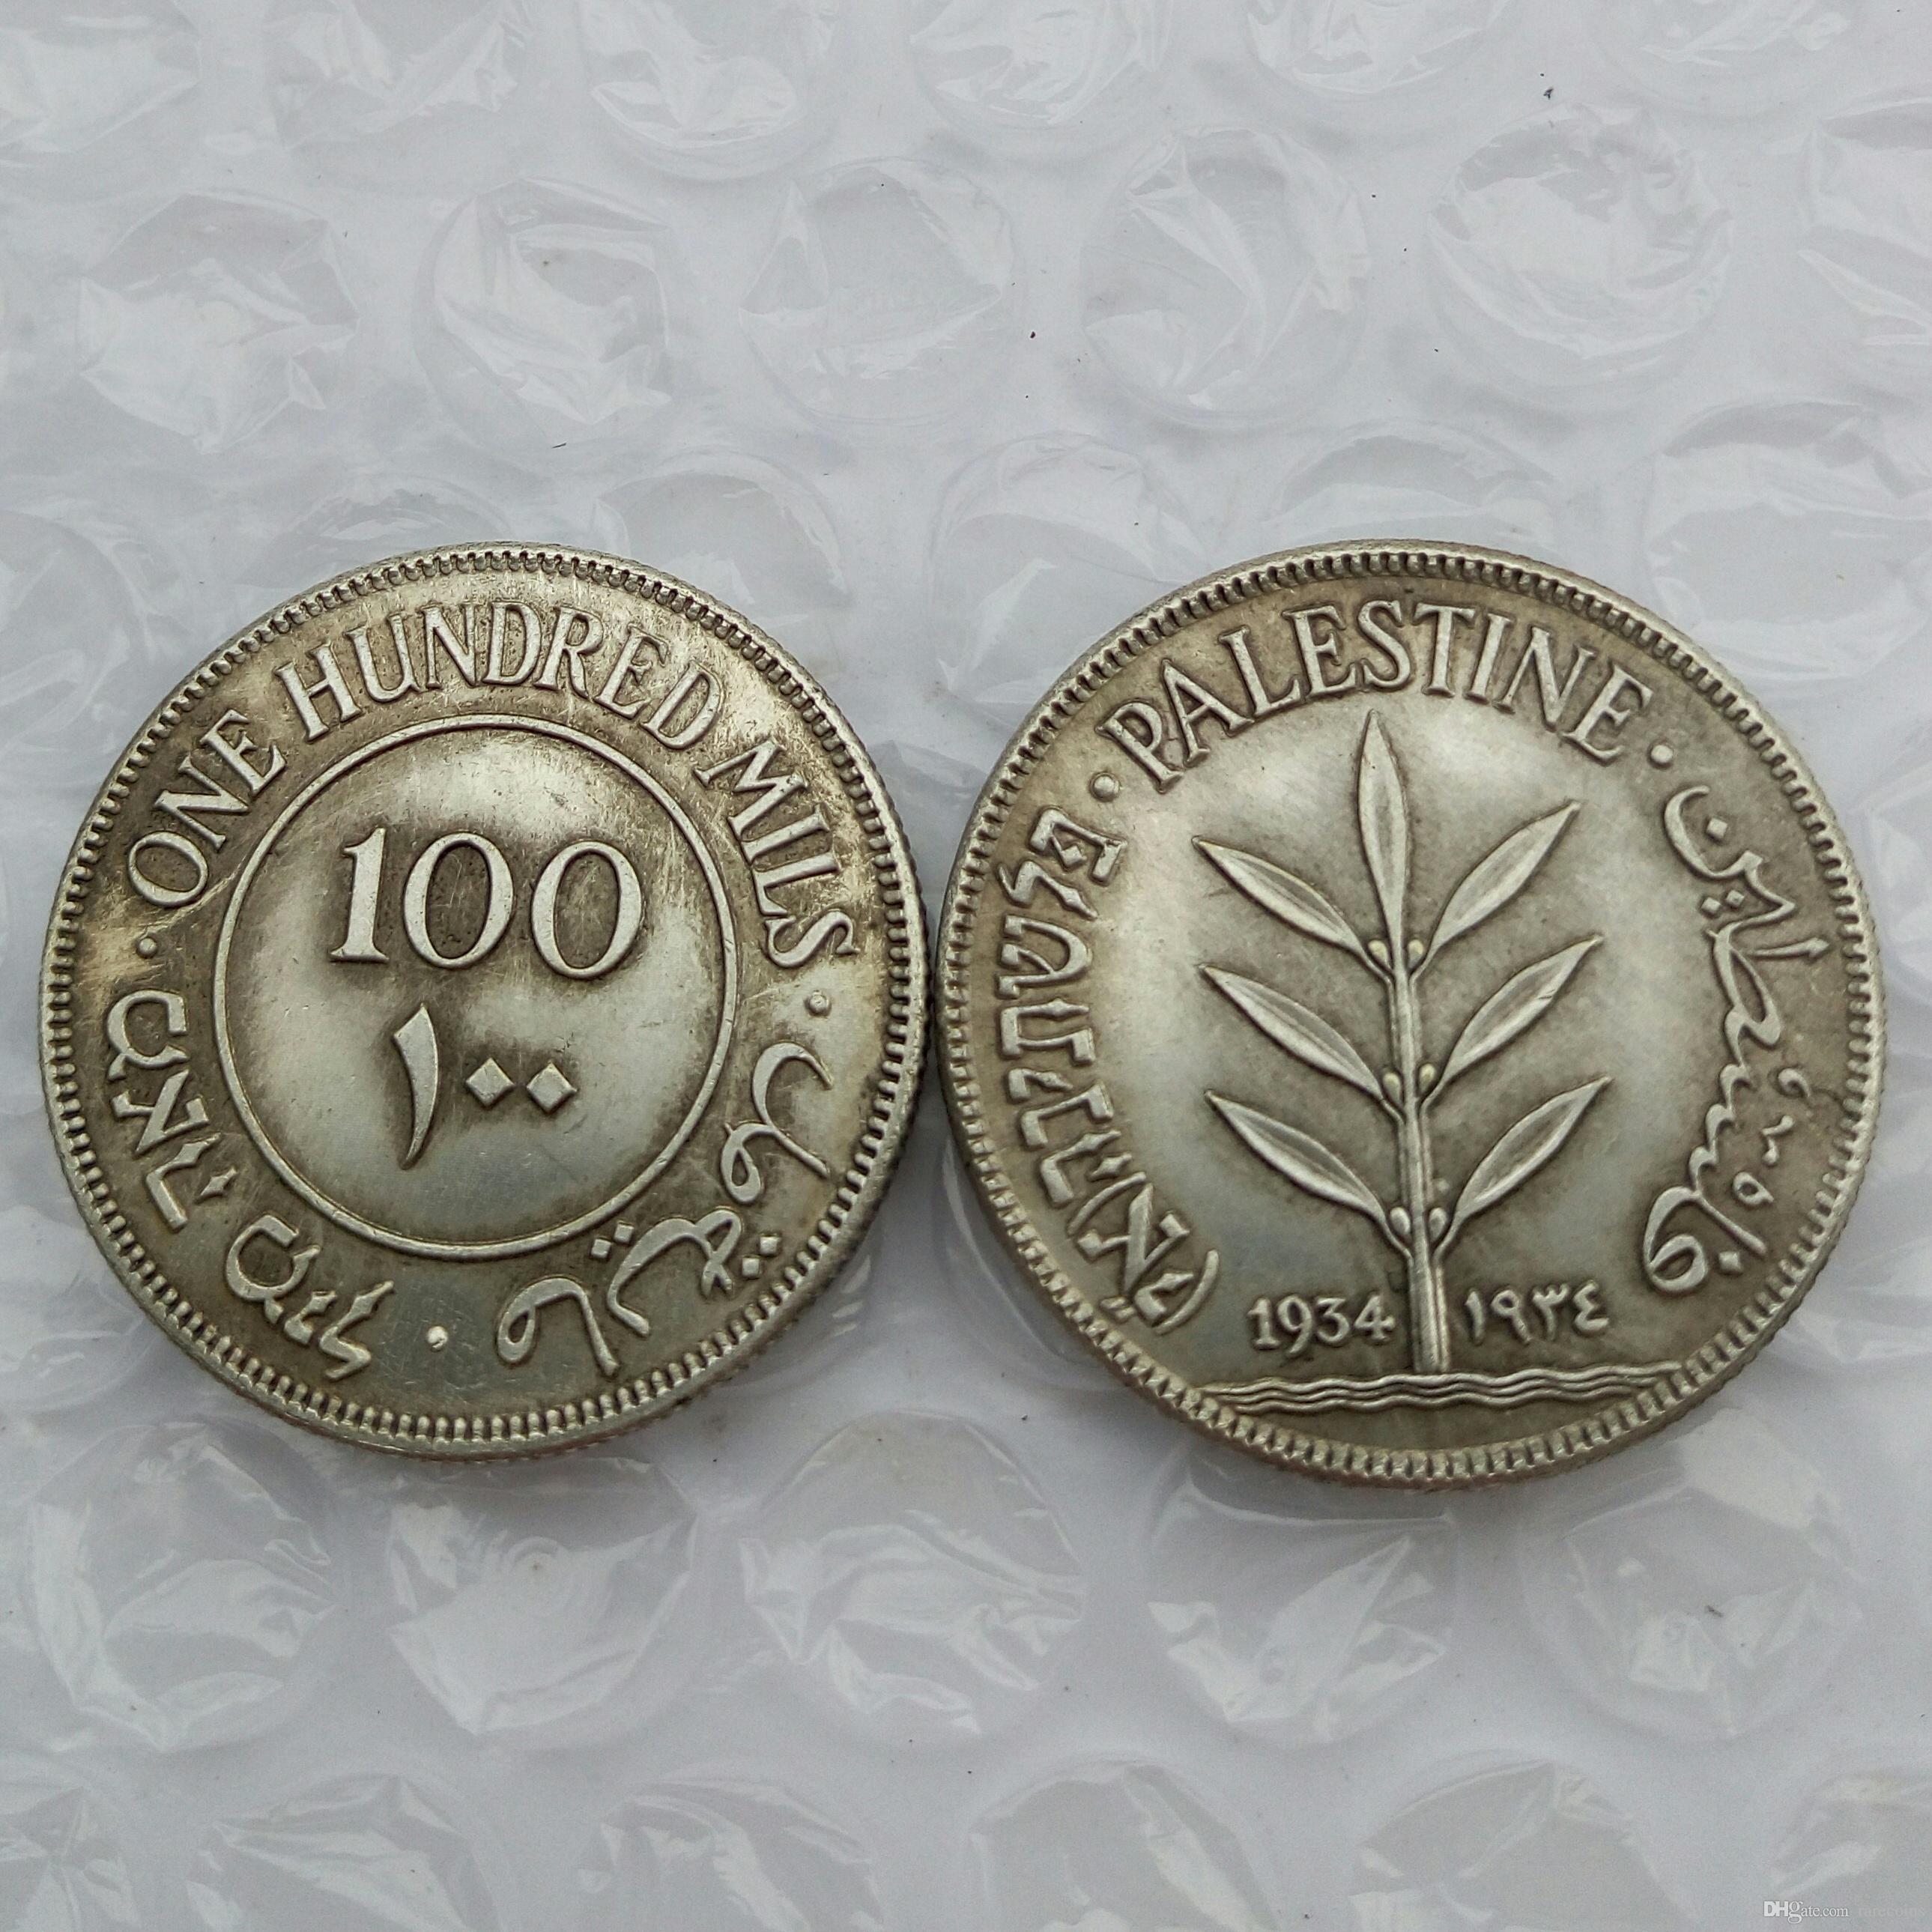 Complete Set of Israel Palestine 1 Mil British Mandate Coins Lot of 10 Coins